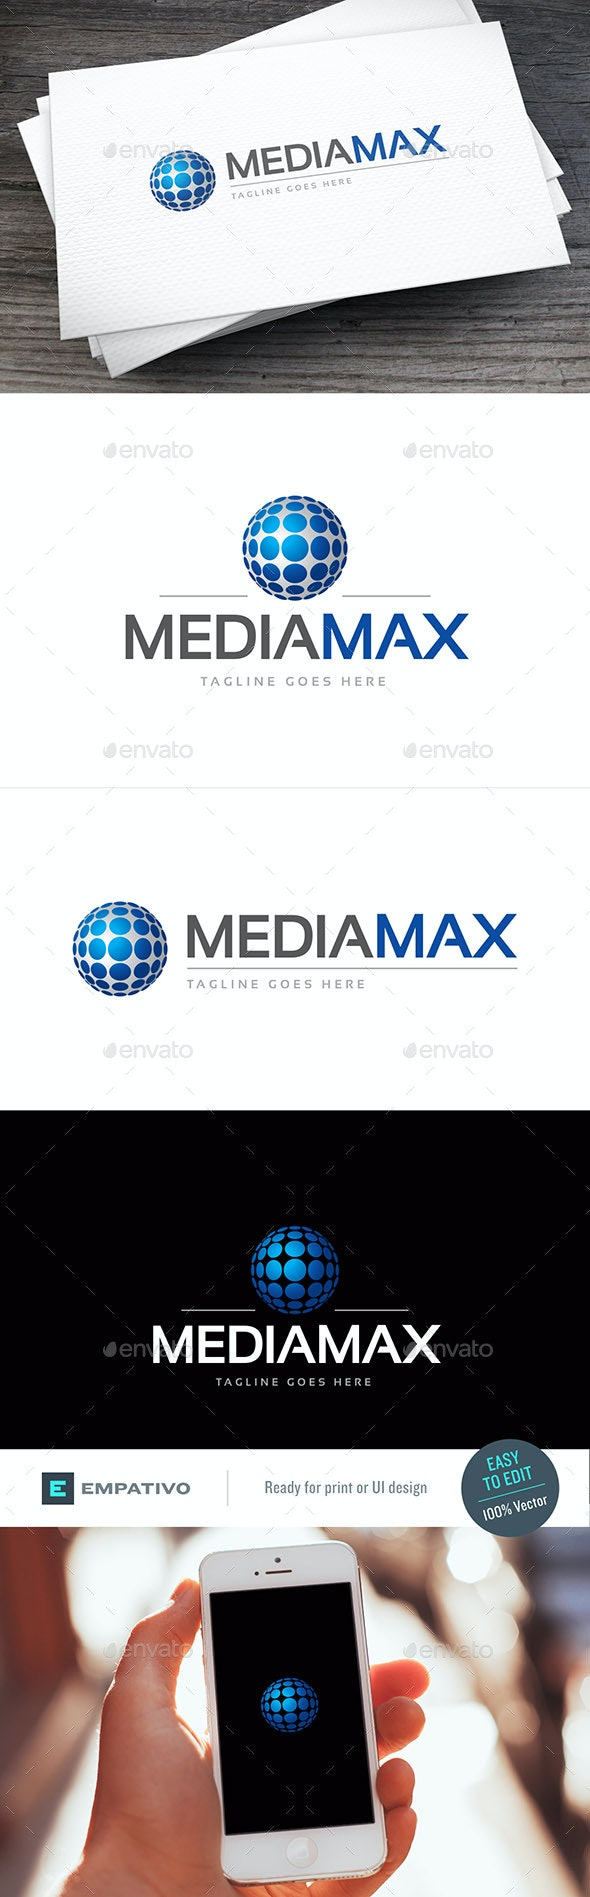 Mediamax Logo Template - Symbols Logo Templates